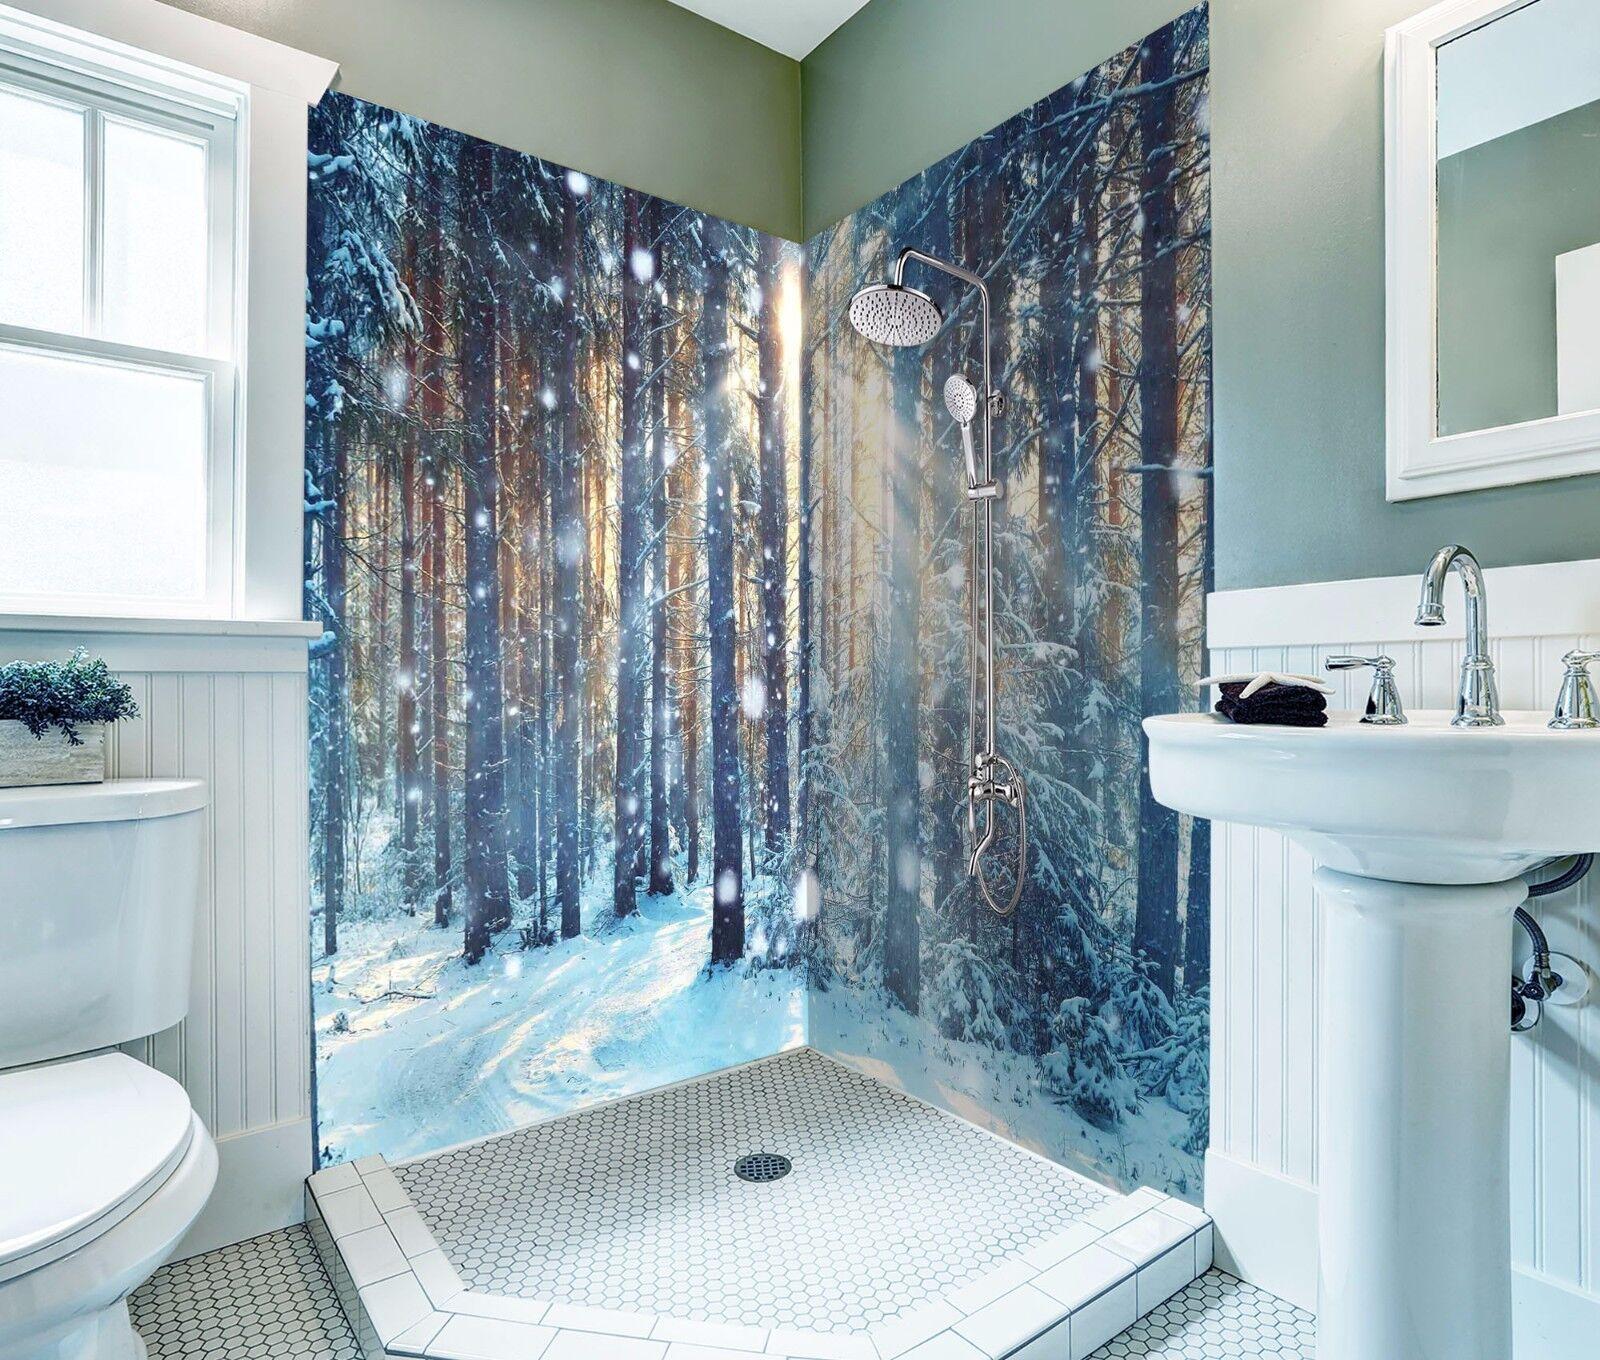 3D Snow Forest 412 WallPaper Bathroom Print Decal Wall Deco AJ WALLPAPER AU